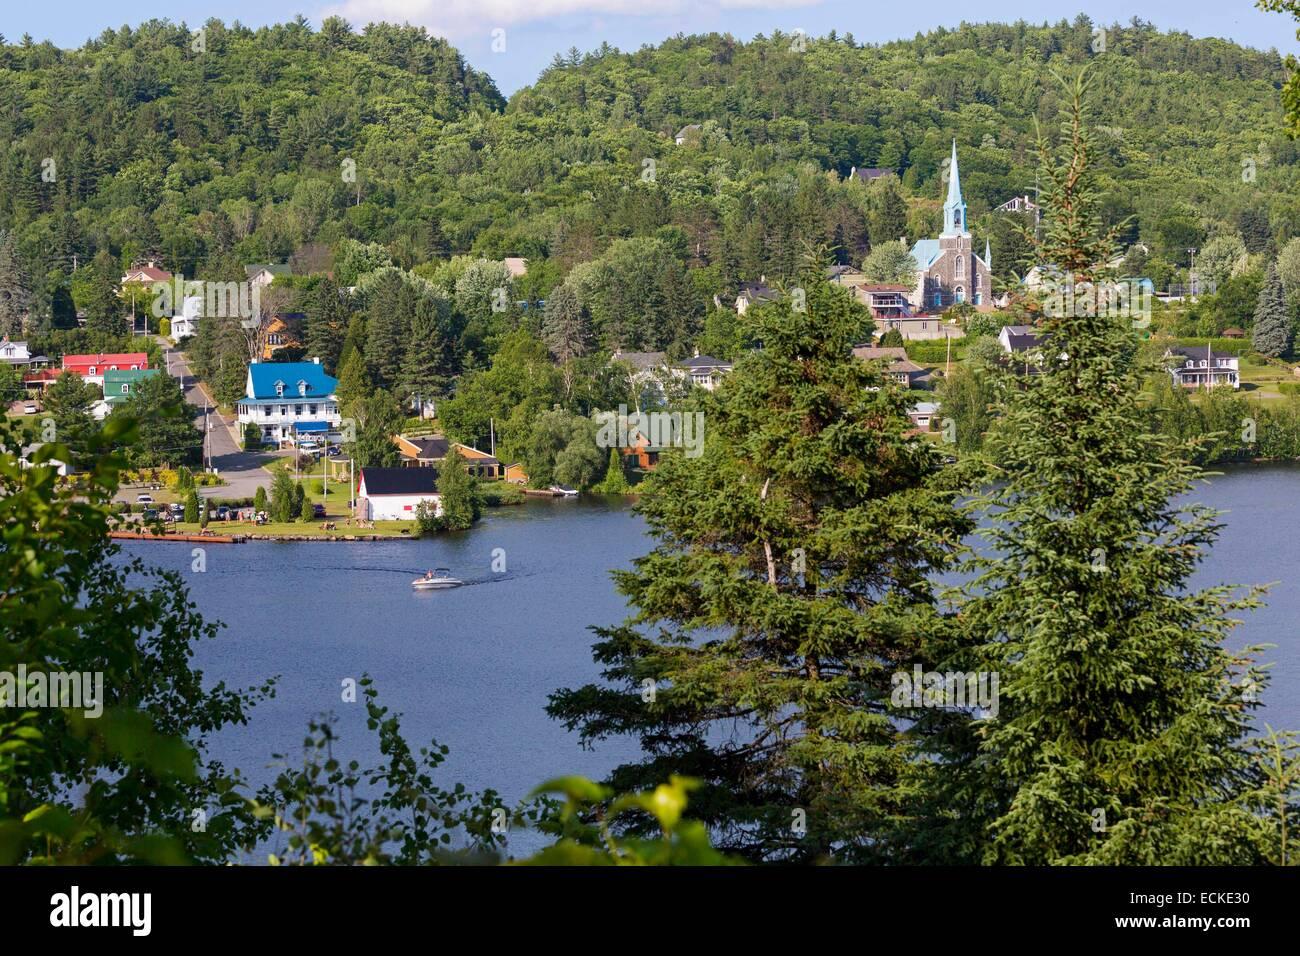 Hotels In Shawinigan Quebec